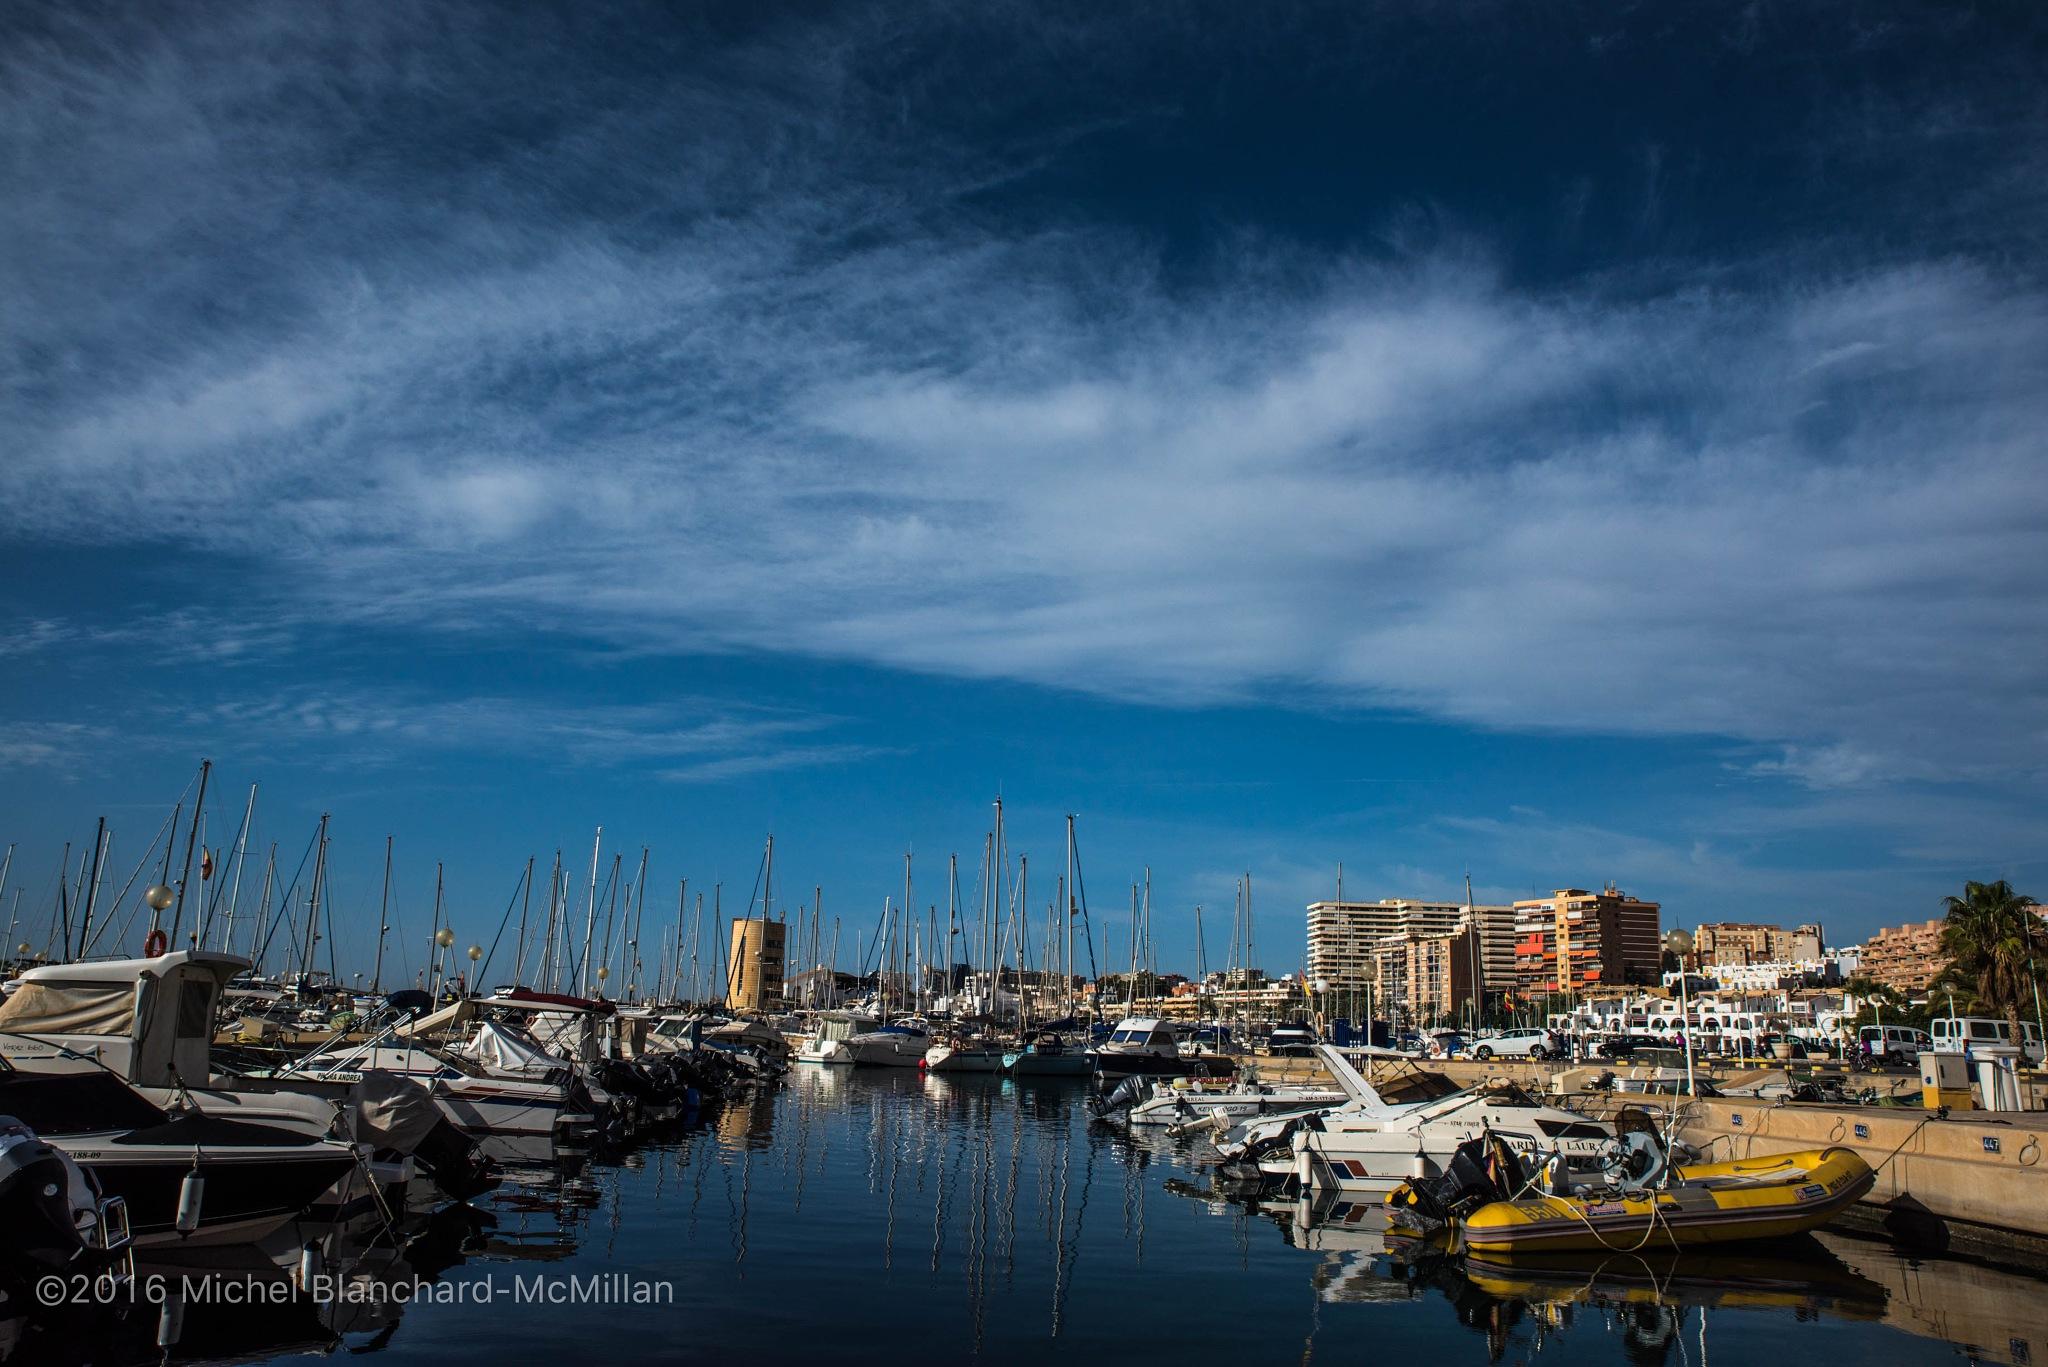 Marina by Michel B